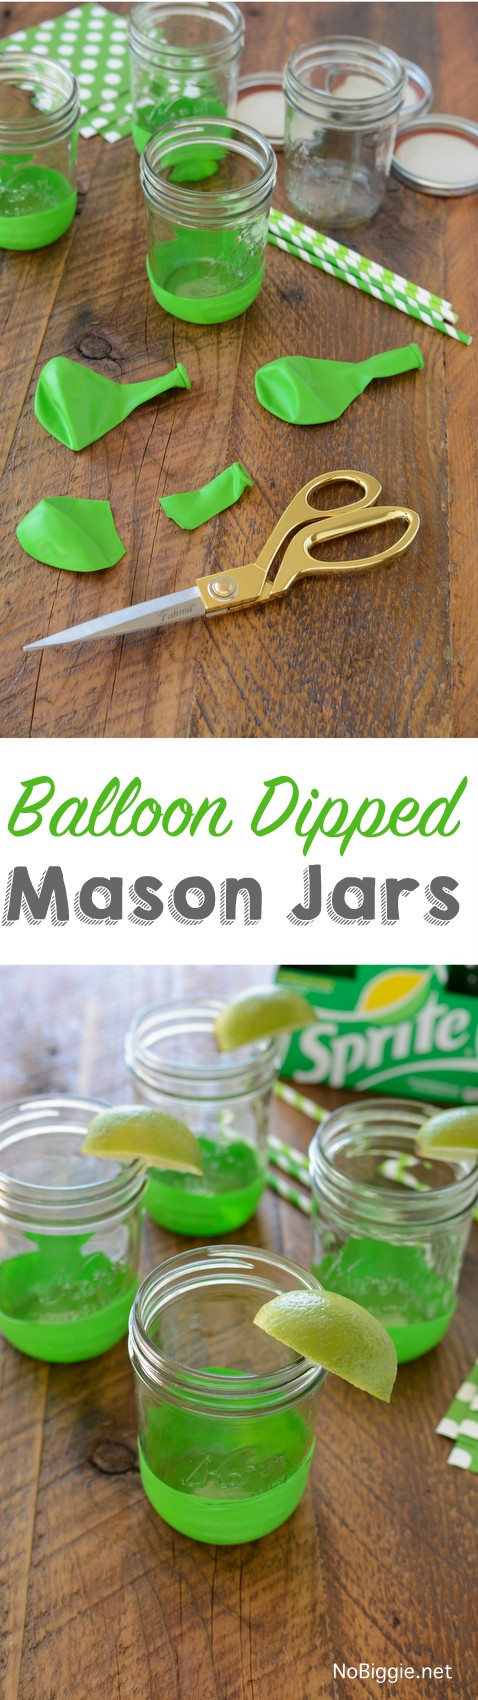 http://www.nobiggie.net/wp-content/uploads/2016/03/balloon-dipped-mason-jars.jpg